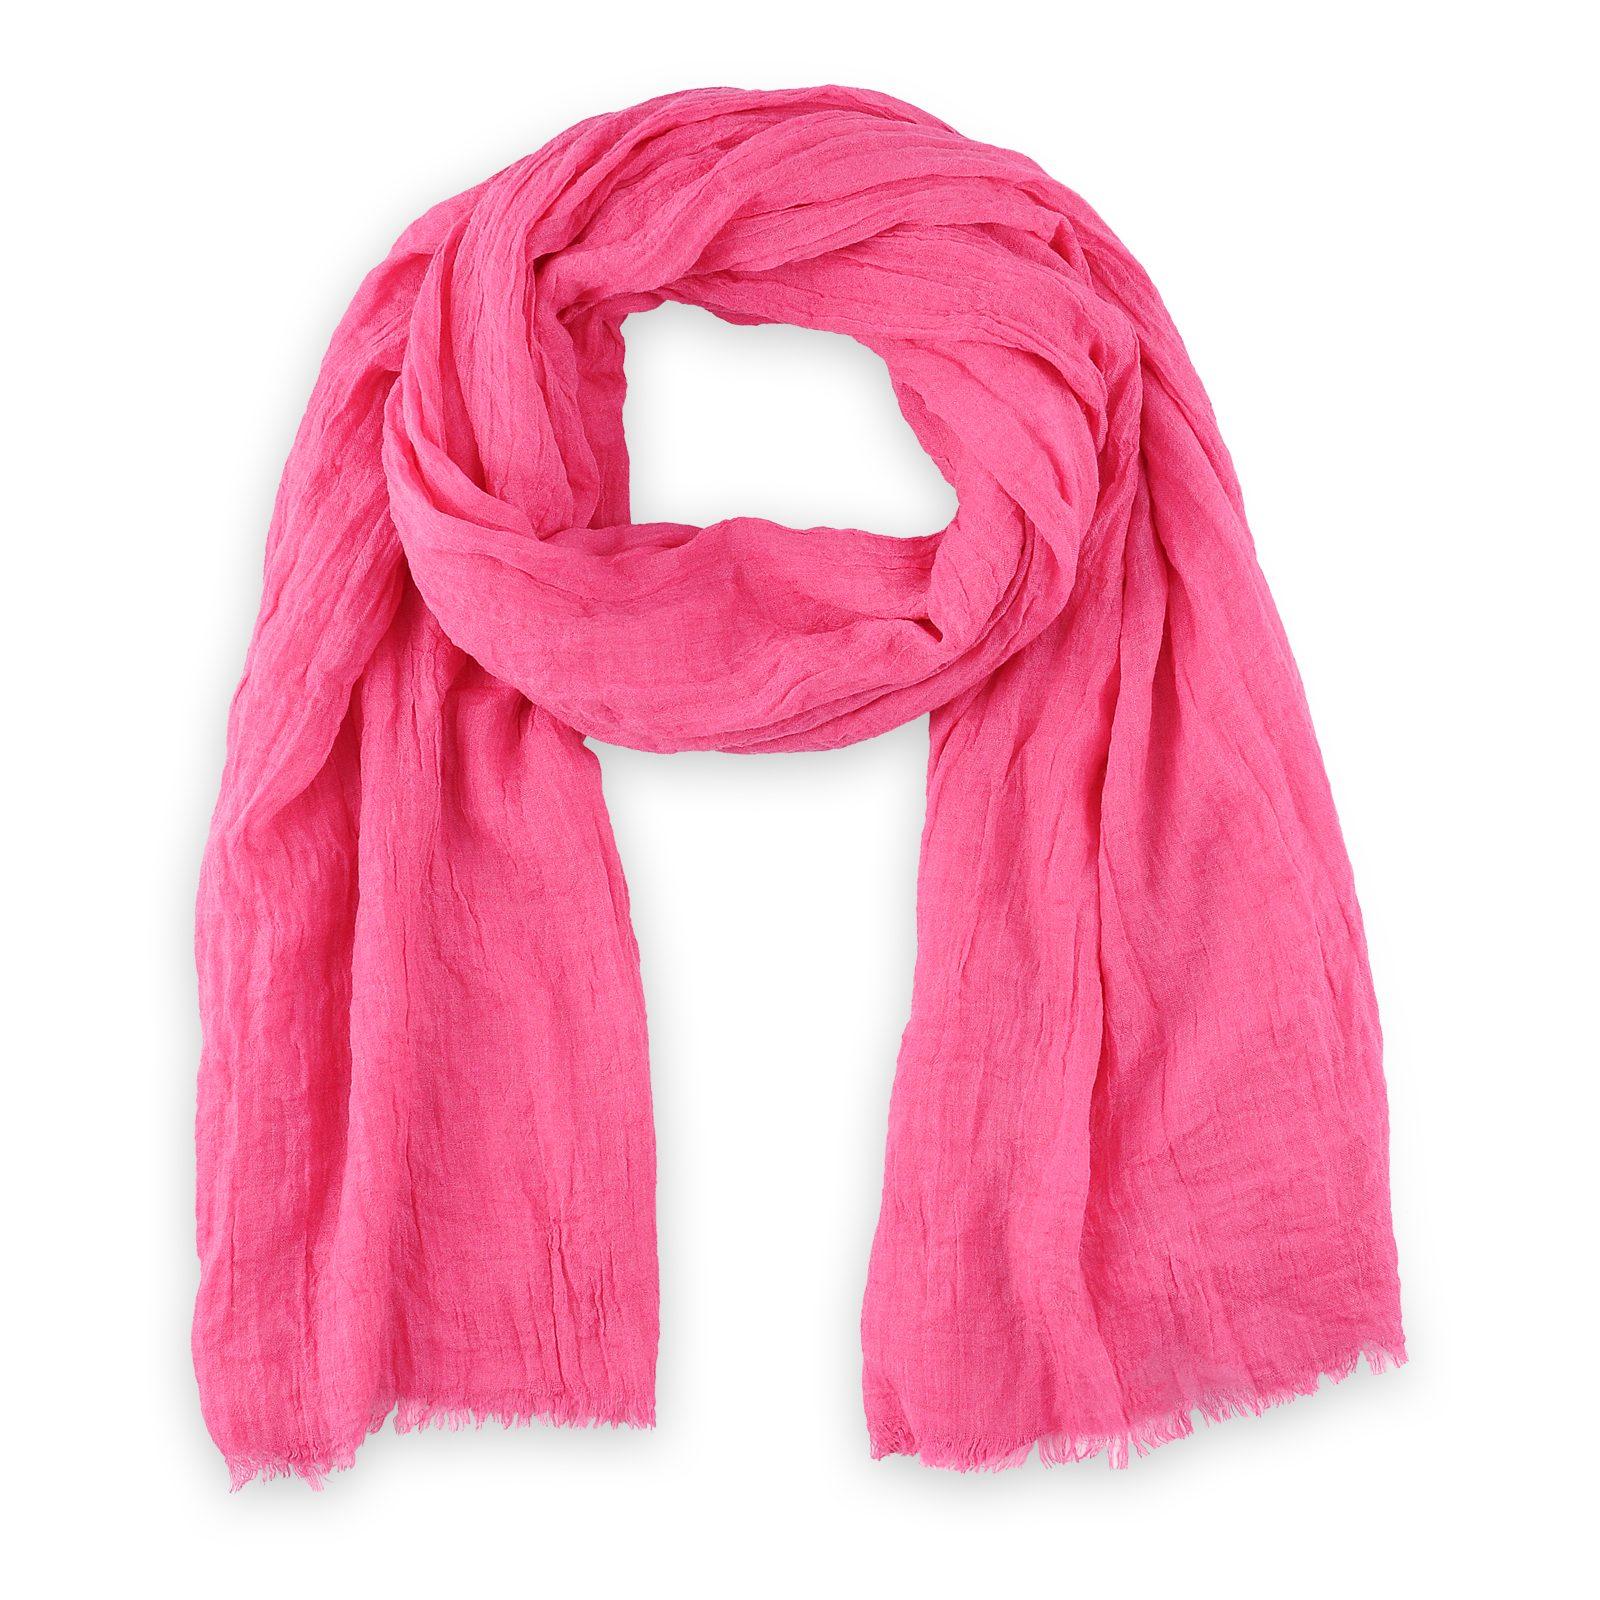 http://lookbook.allee-du-foulard.fr/wp-content/uploads/2018/11/AT-02328-F16-1600x1600.jpg